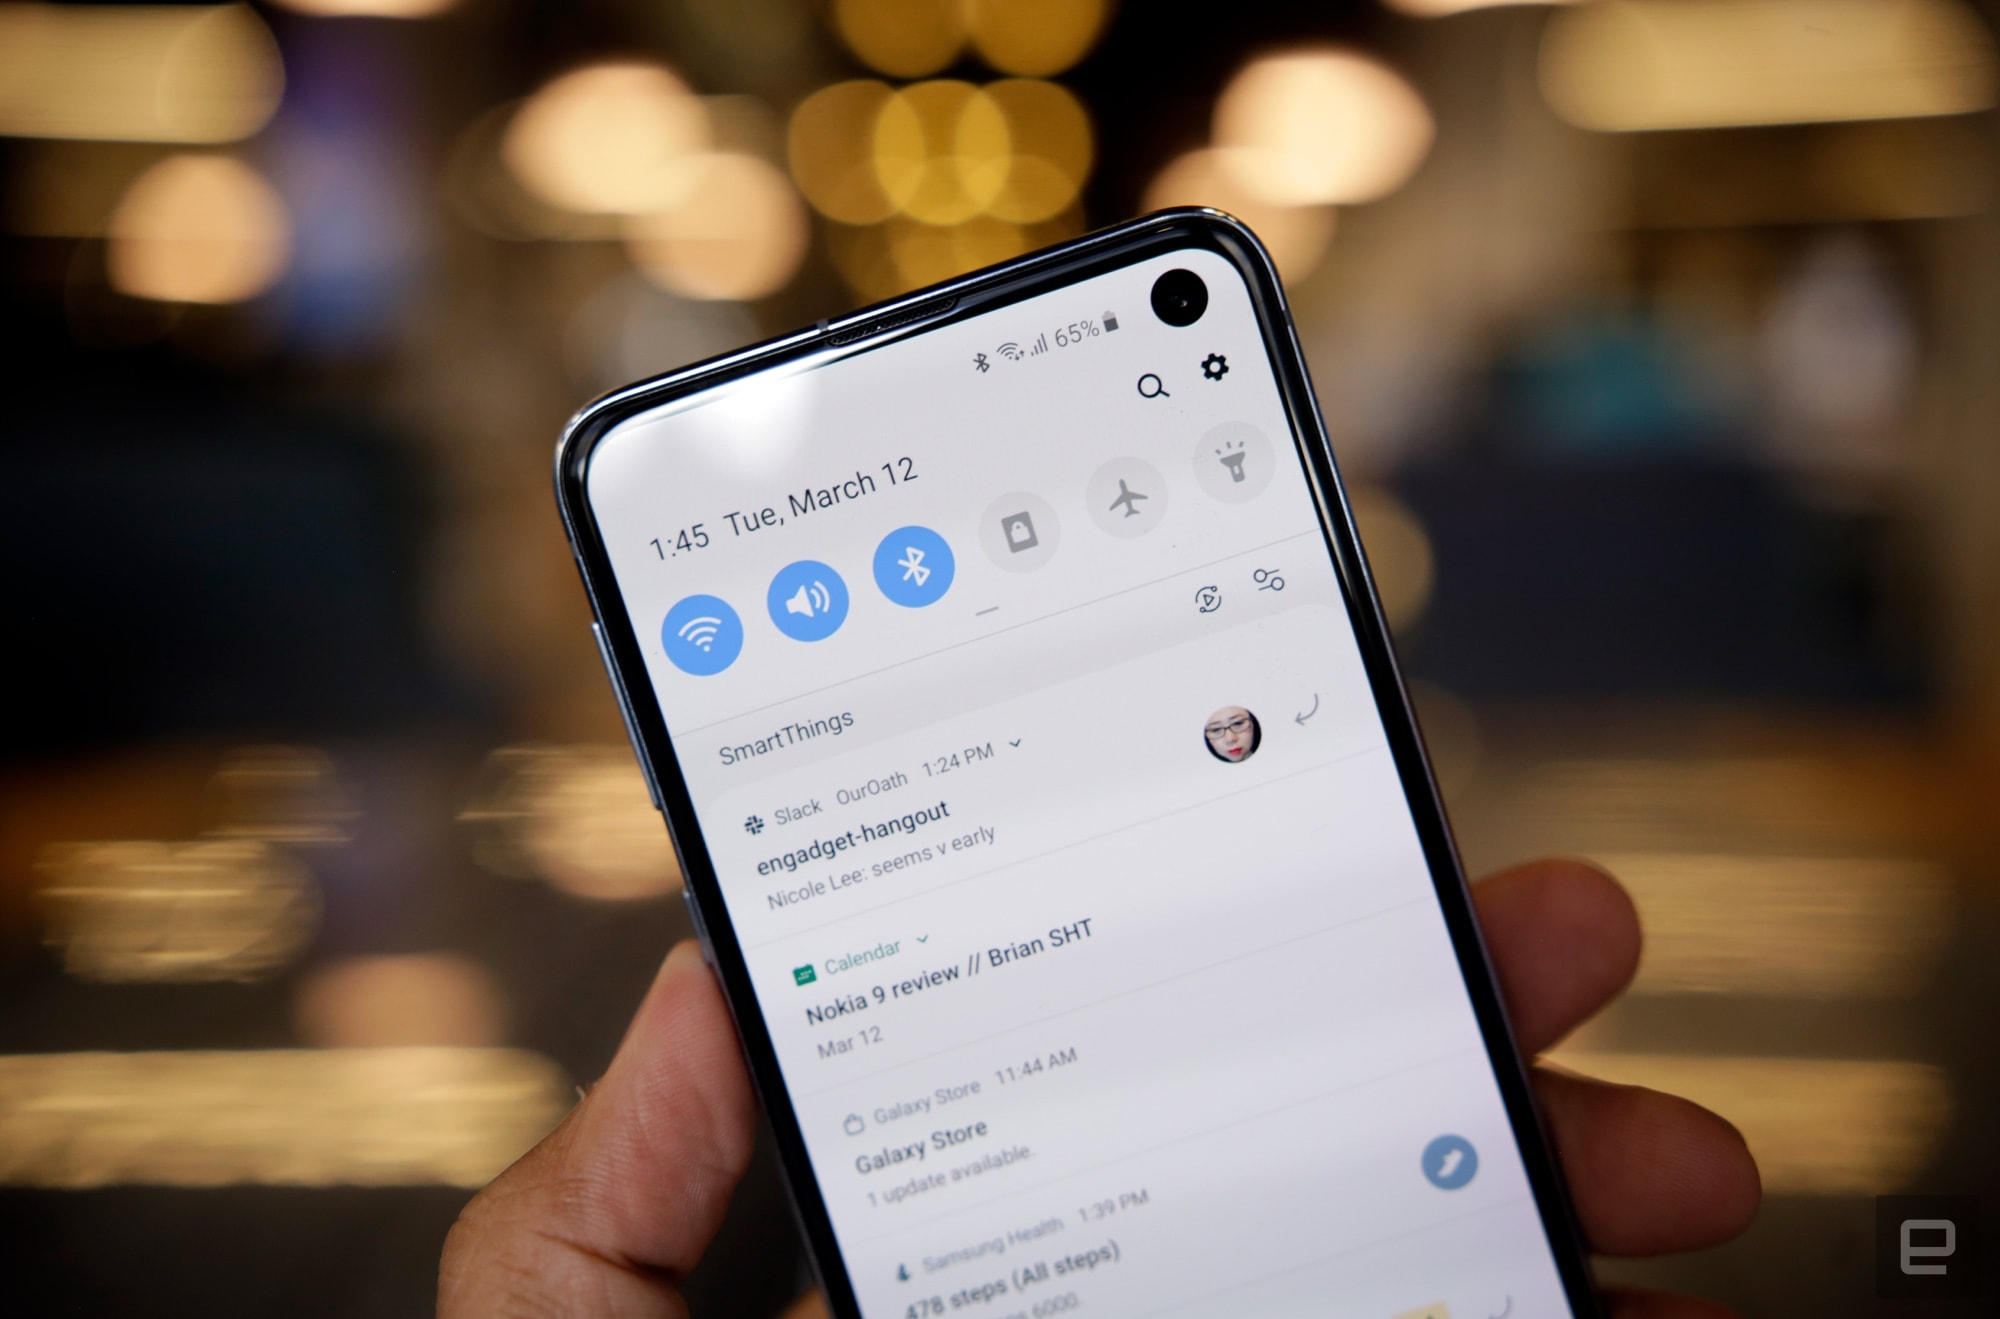 Samsung Galaxy S10e review: Smaller, but not lesser